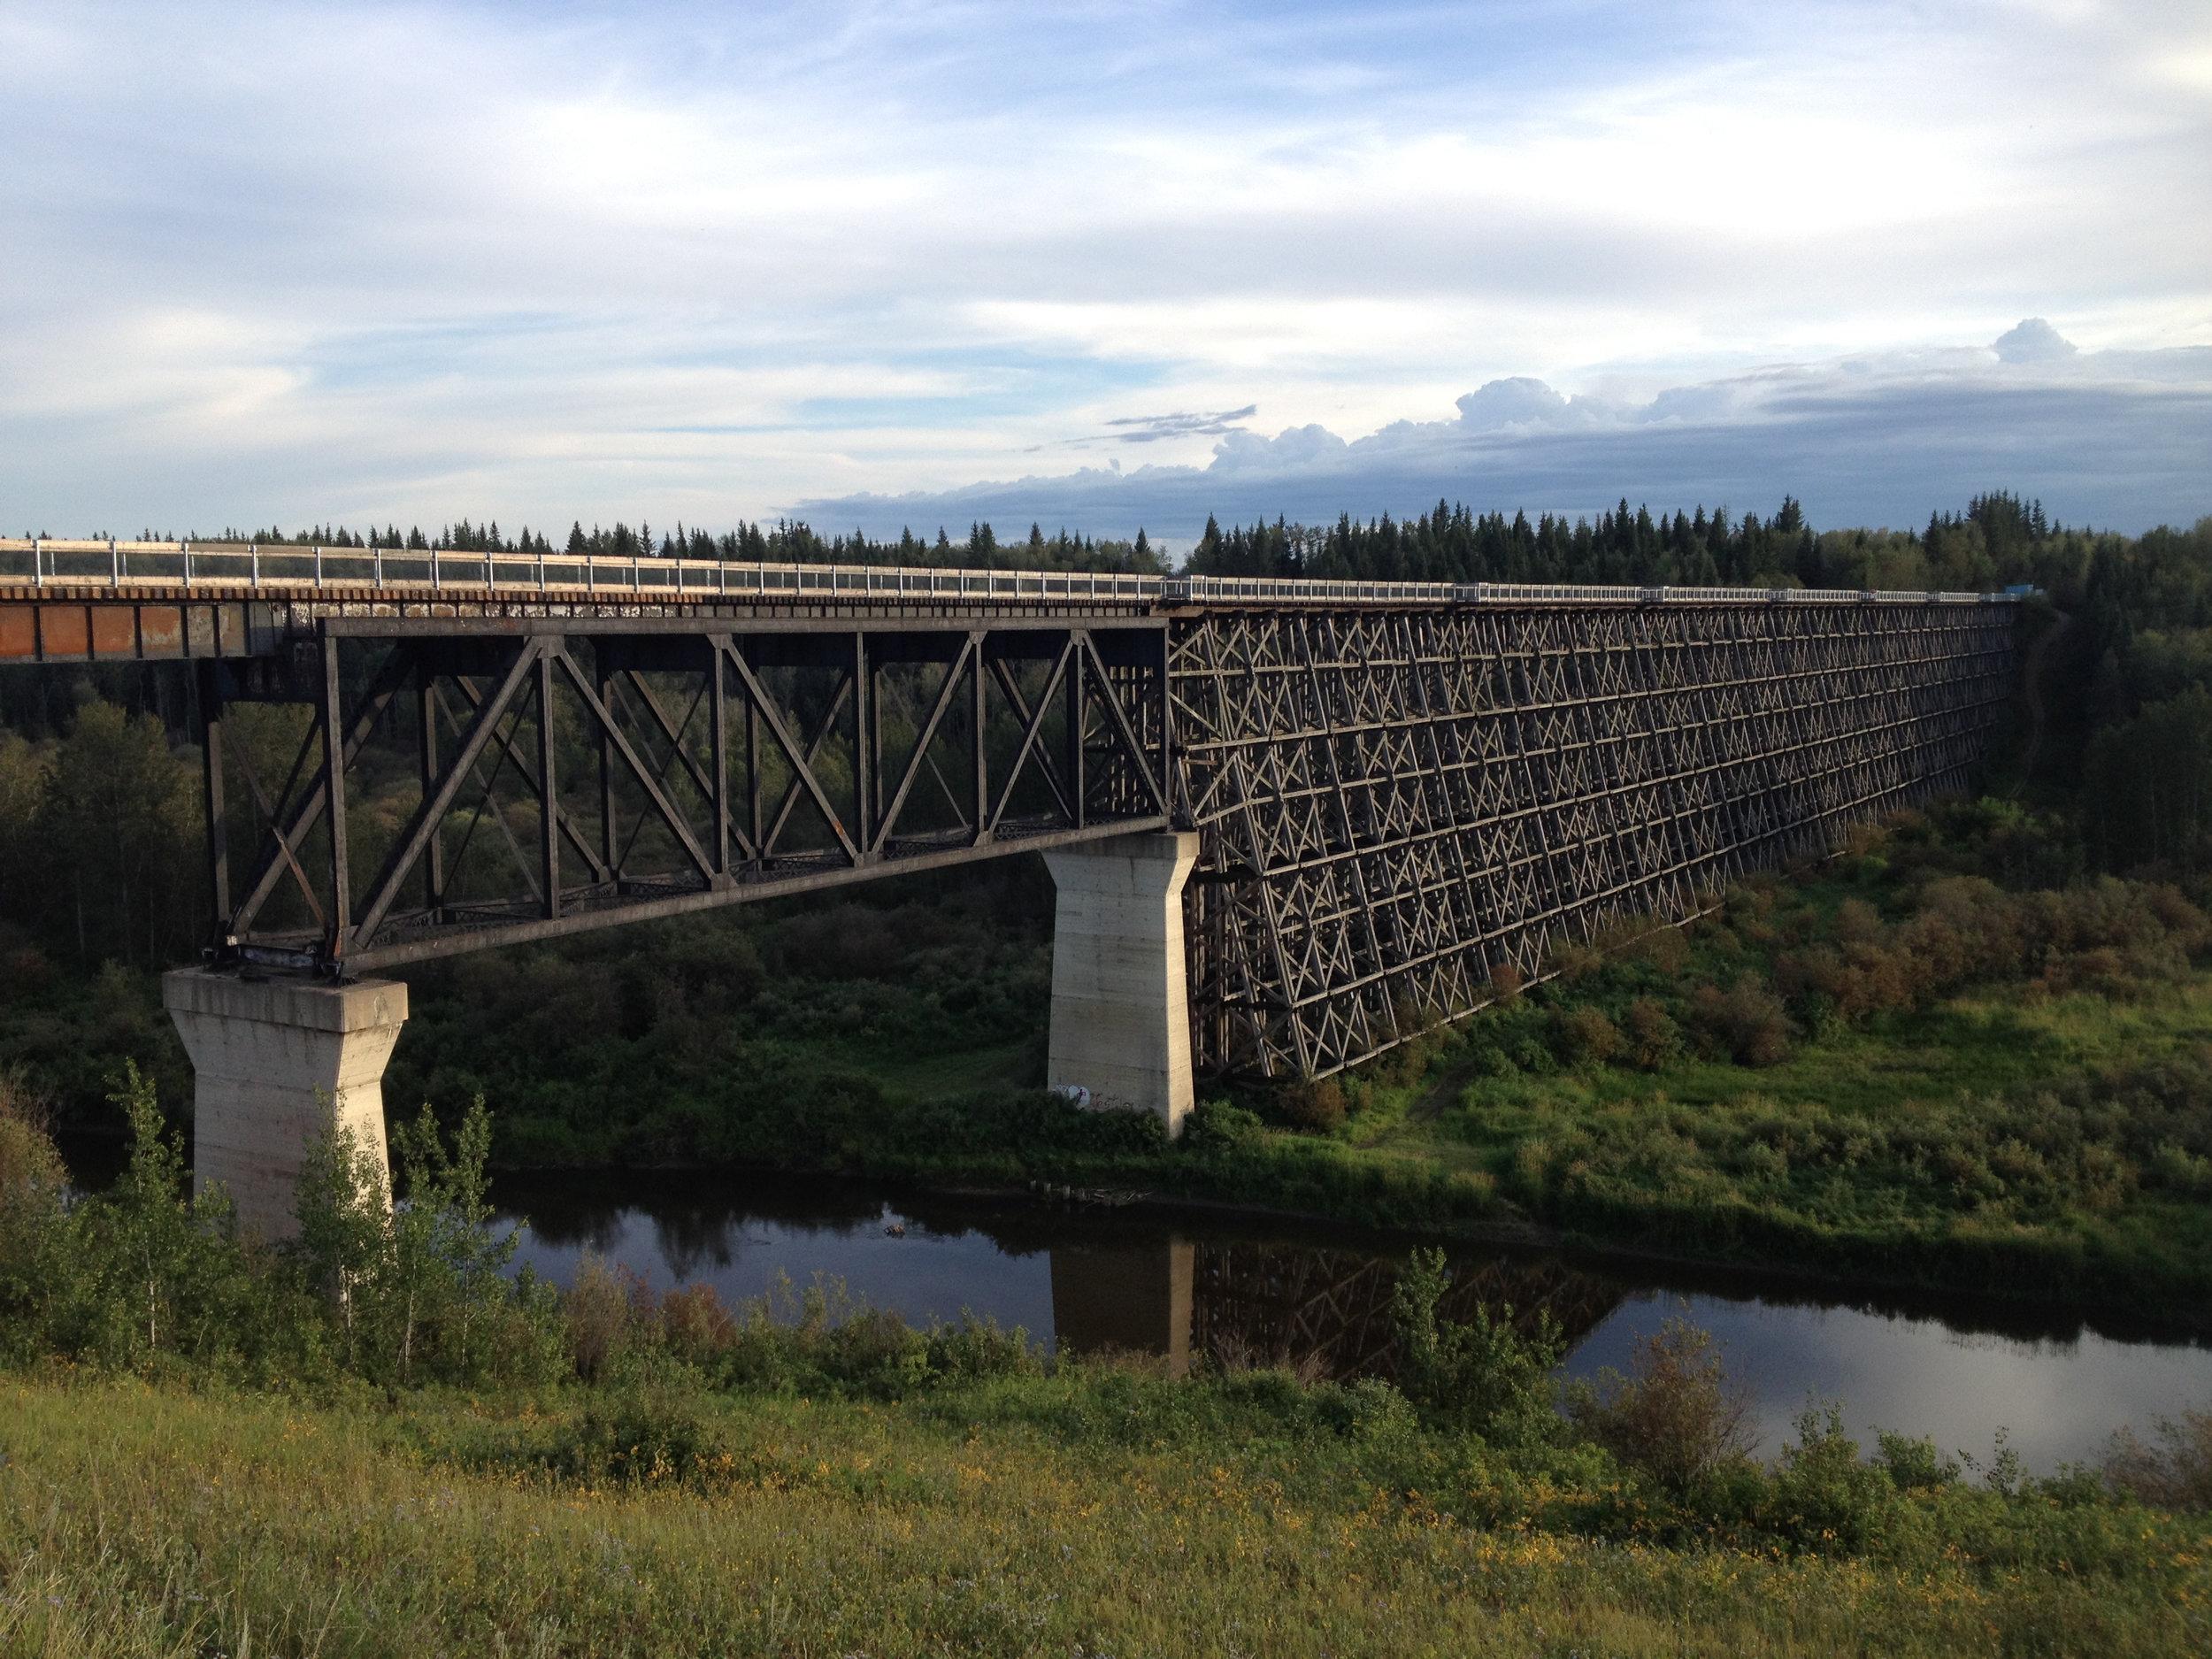 Train Trestle Bridge crossing over Beaver River